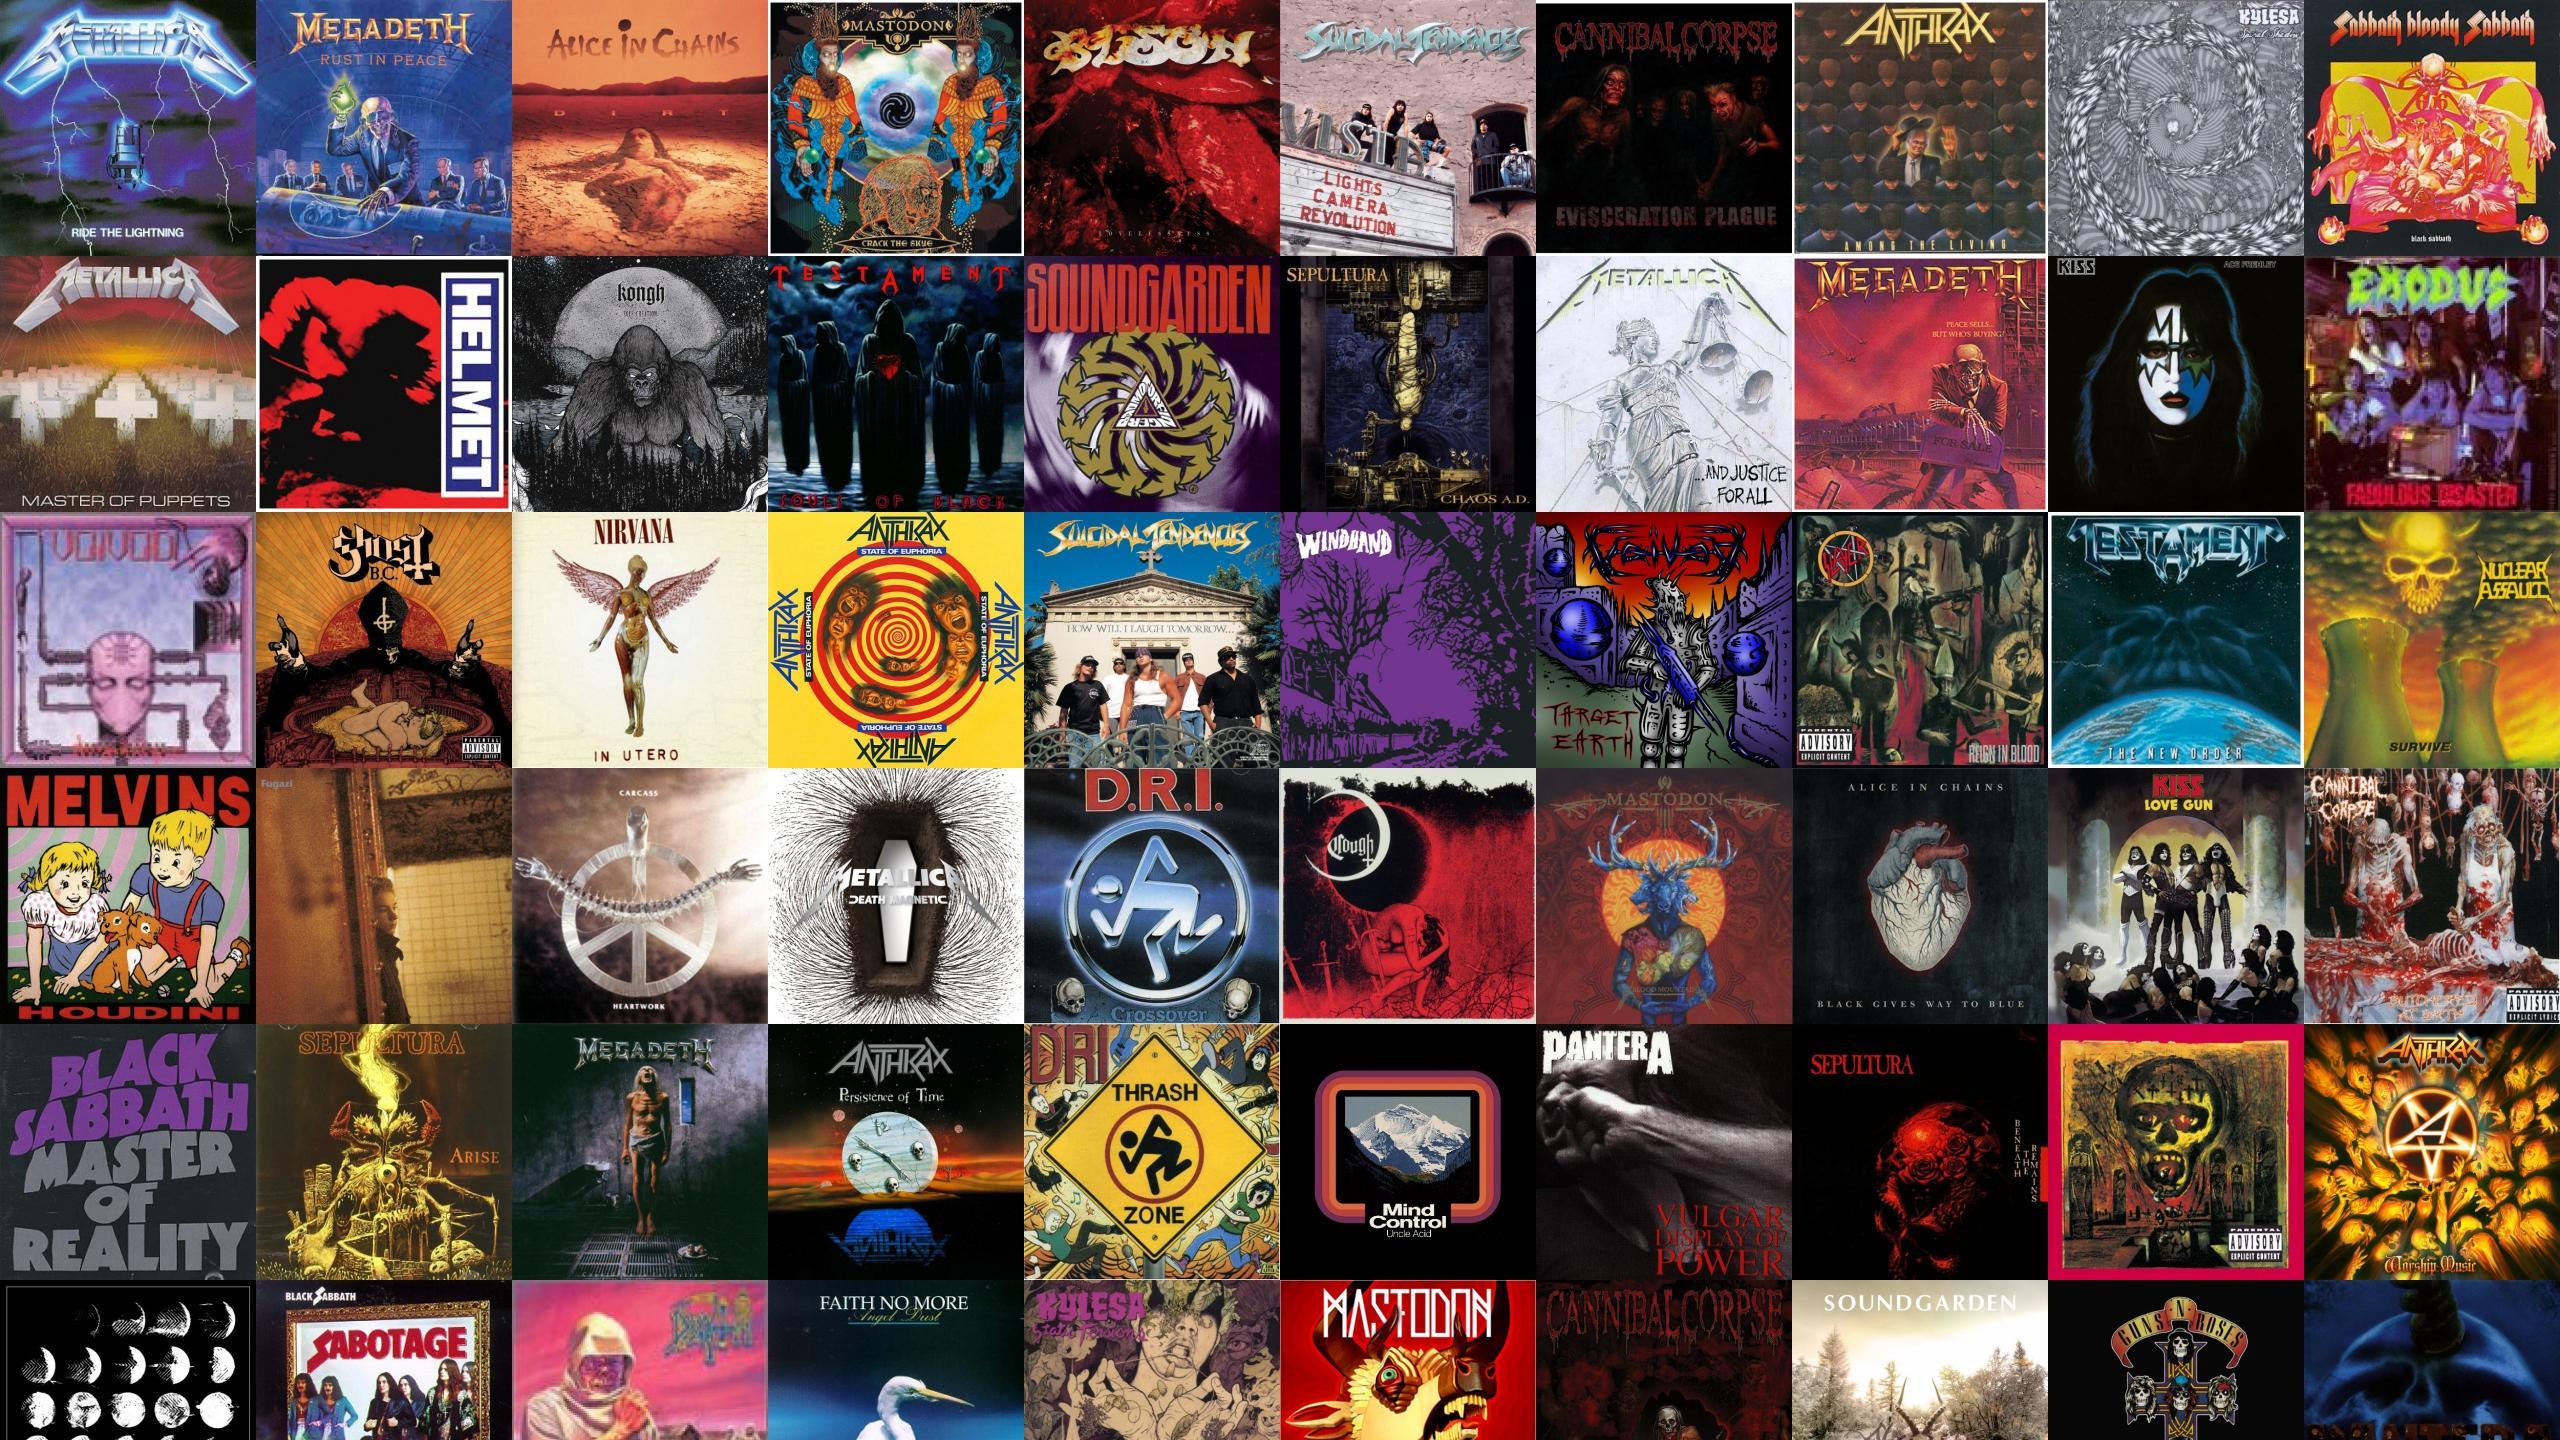 Collage Tile Tiles Music Heavy Metal R Wallpaper 2560x1440 101178 Wallpaperup